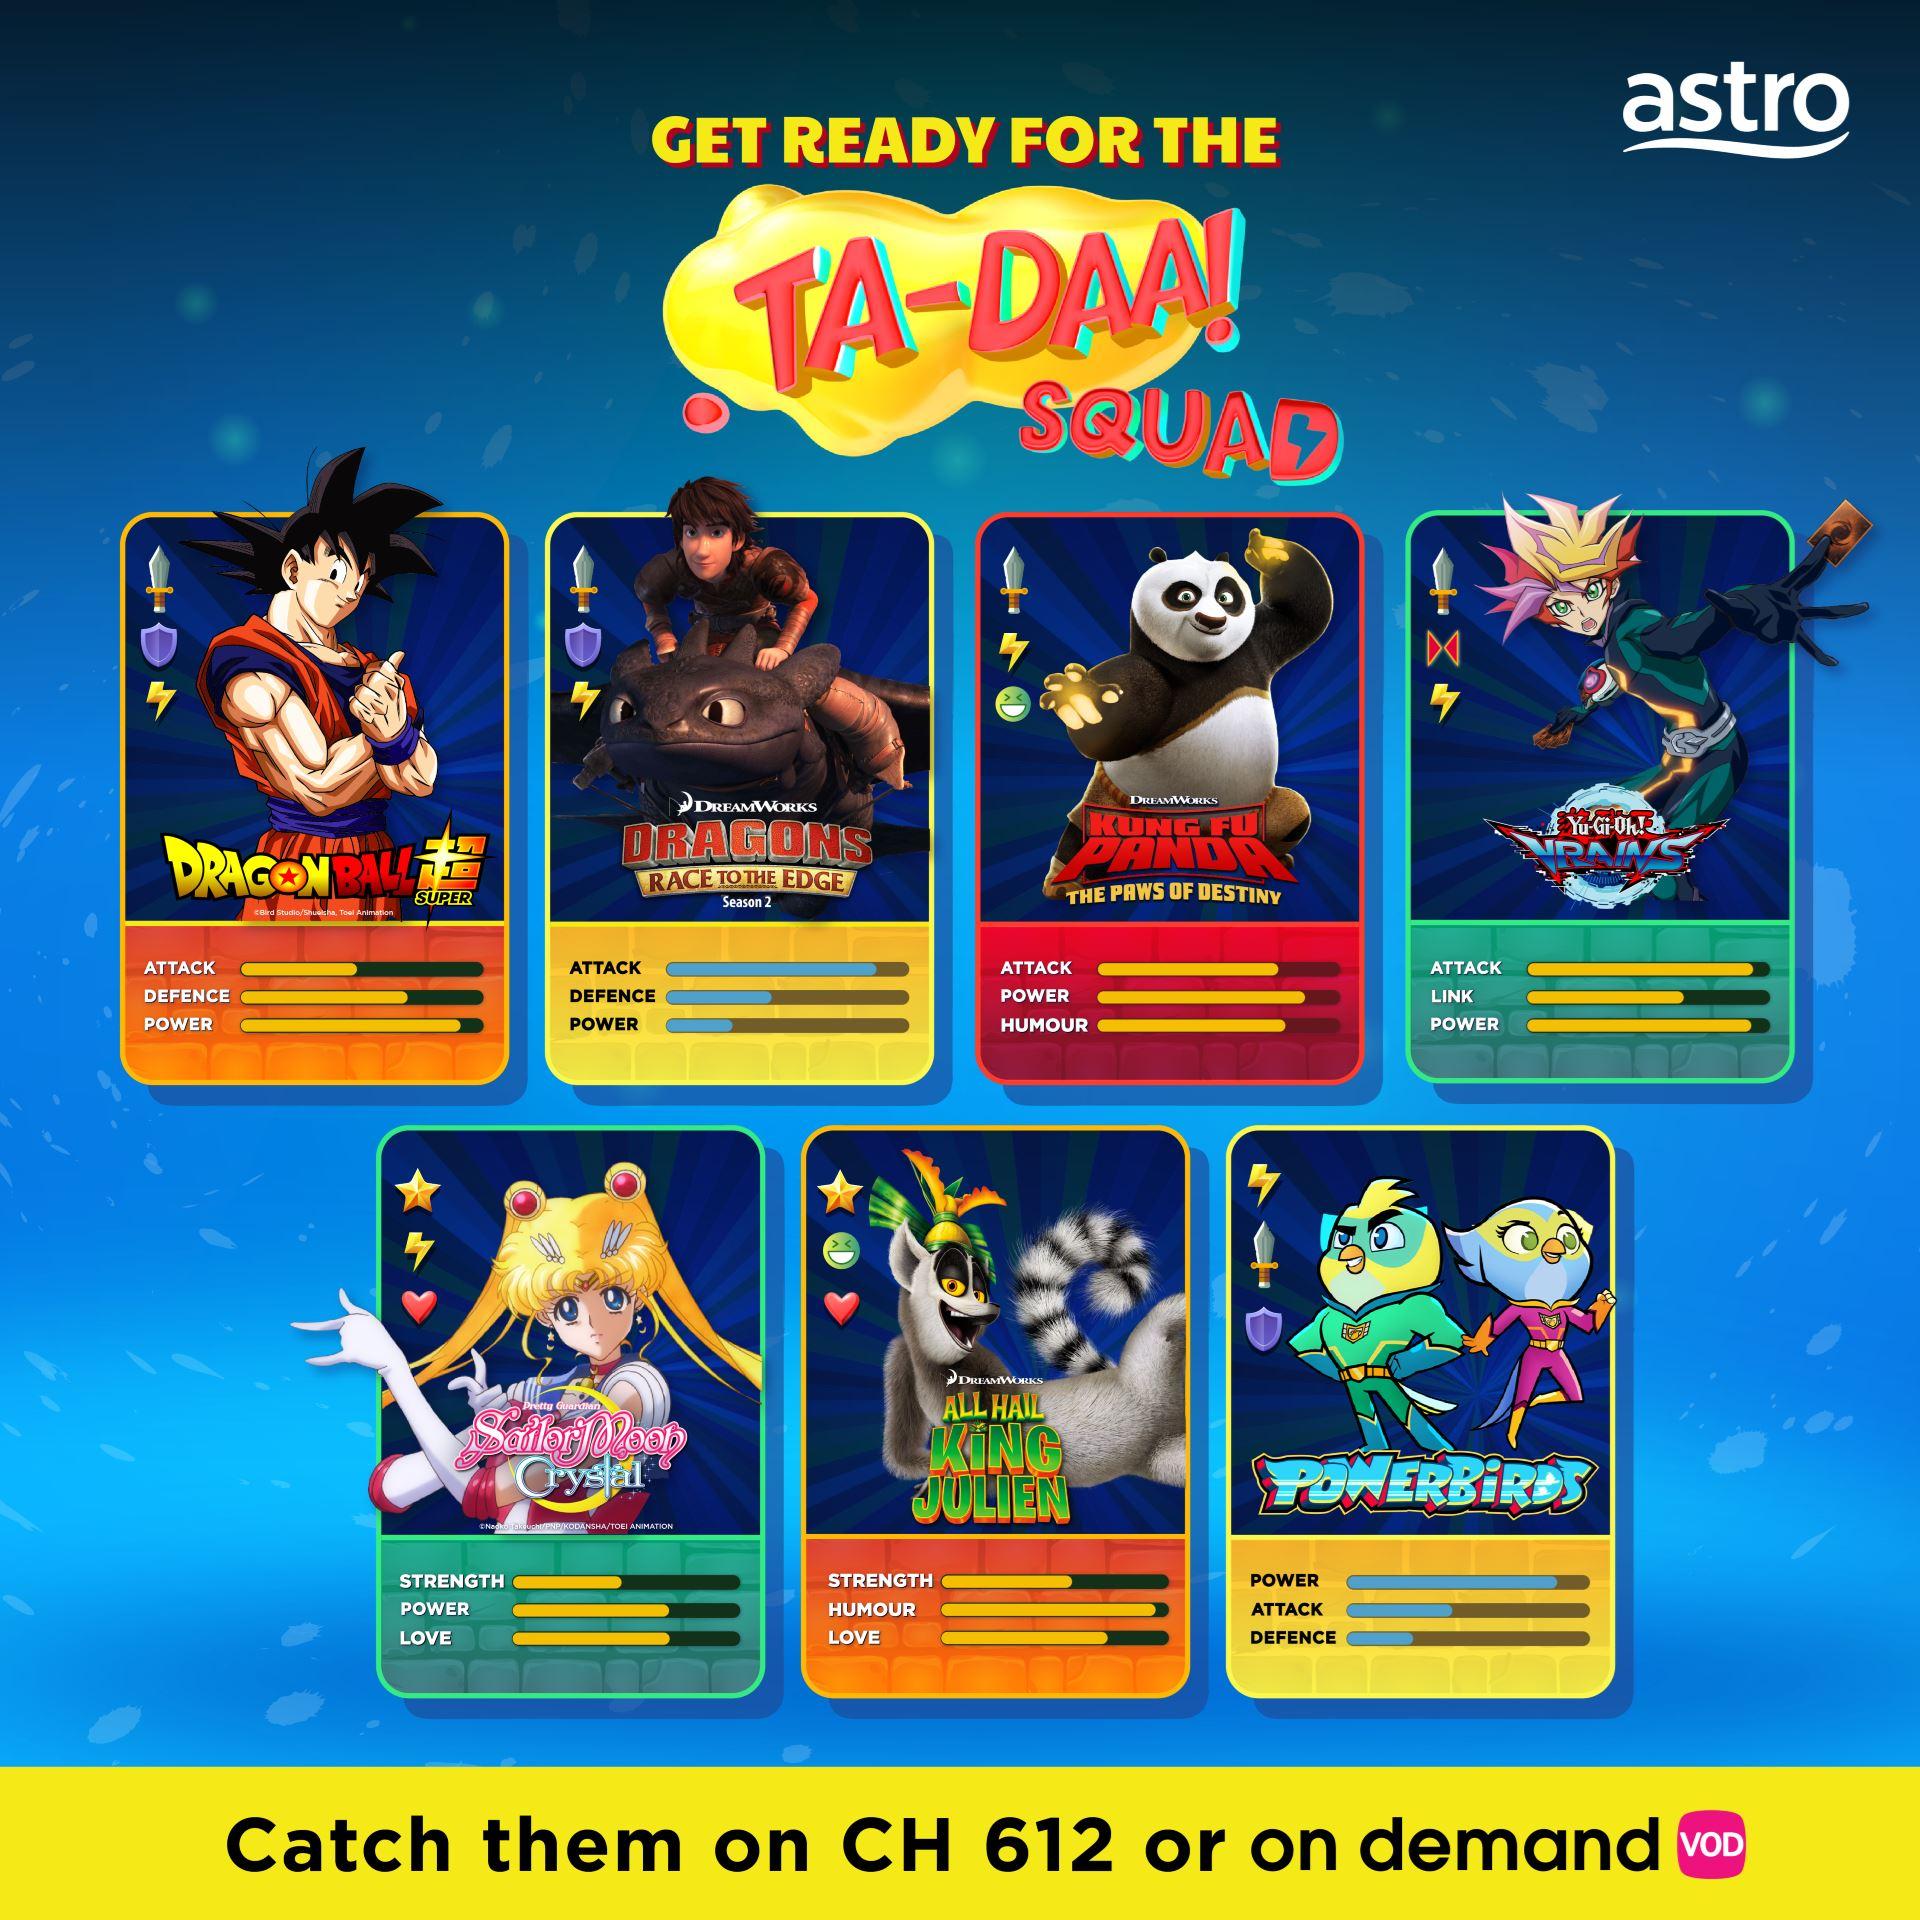 cuti sekolah is here! enjoy these popular kids' favourites on astro!